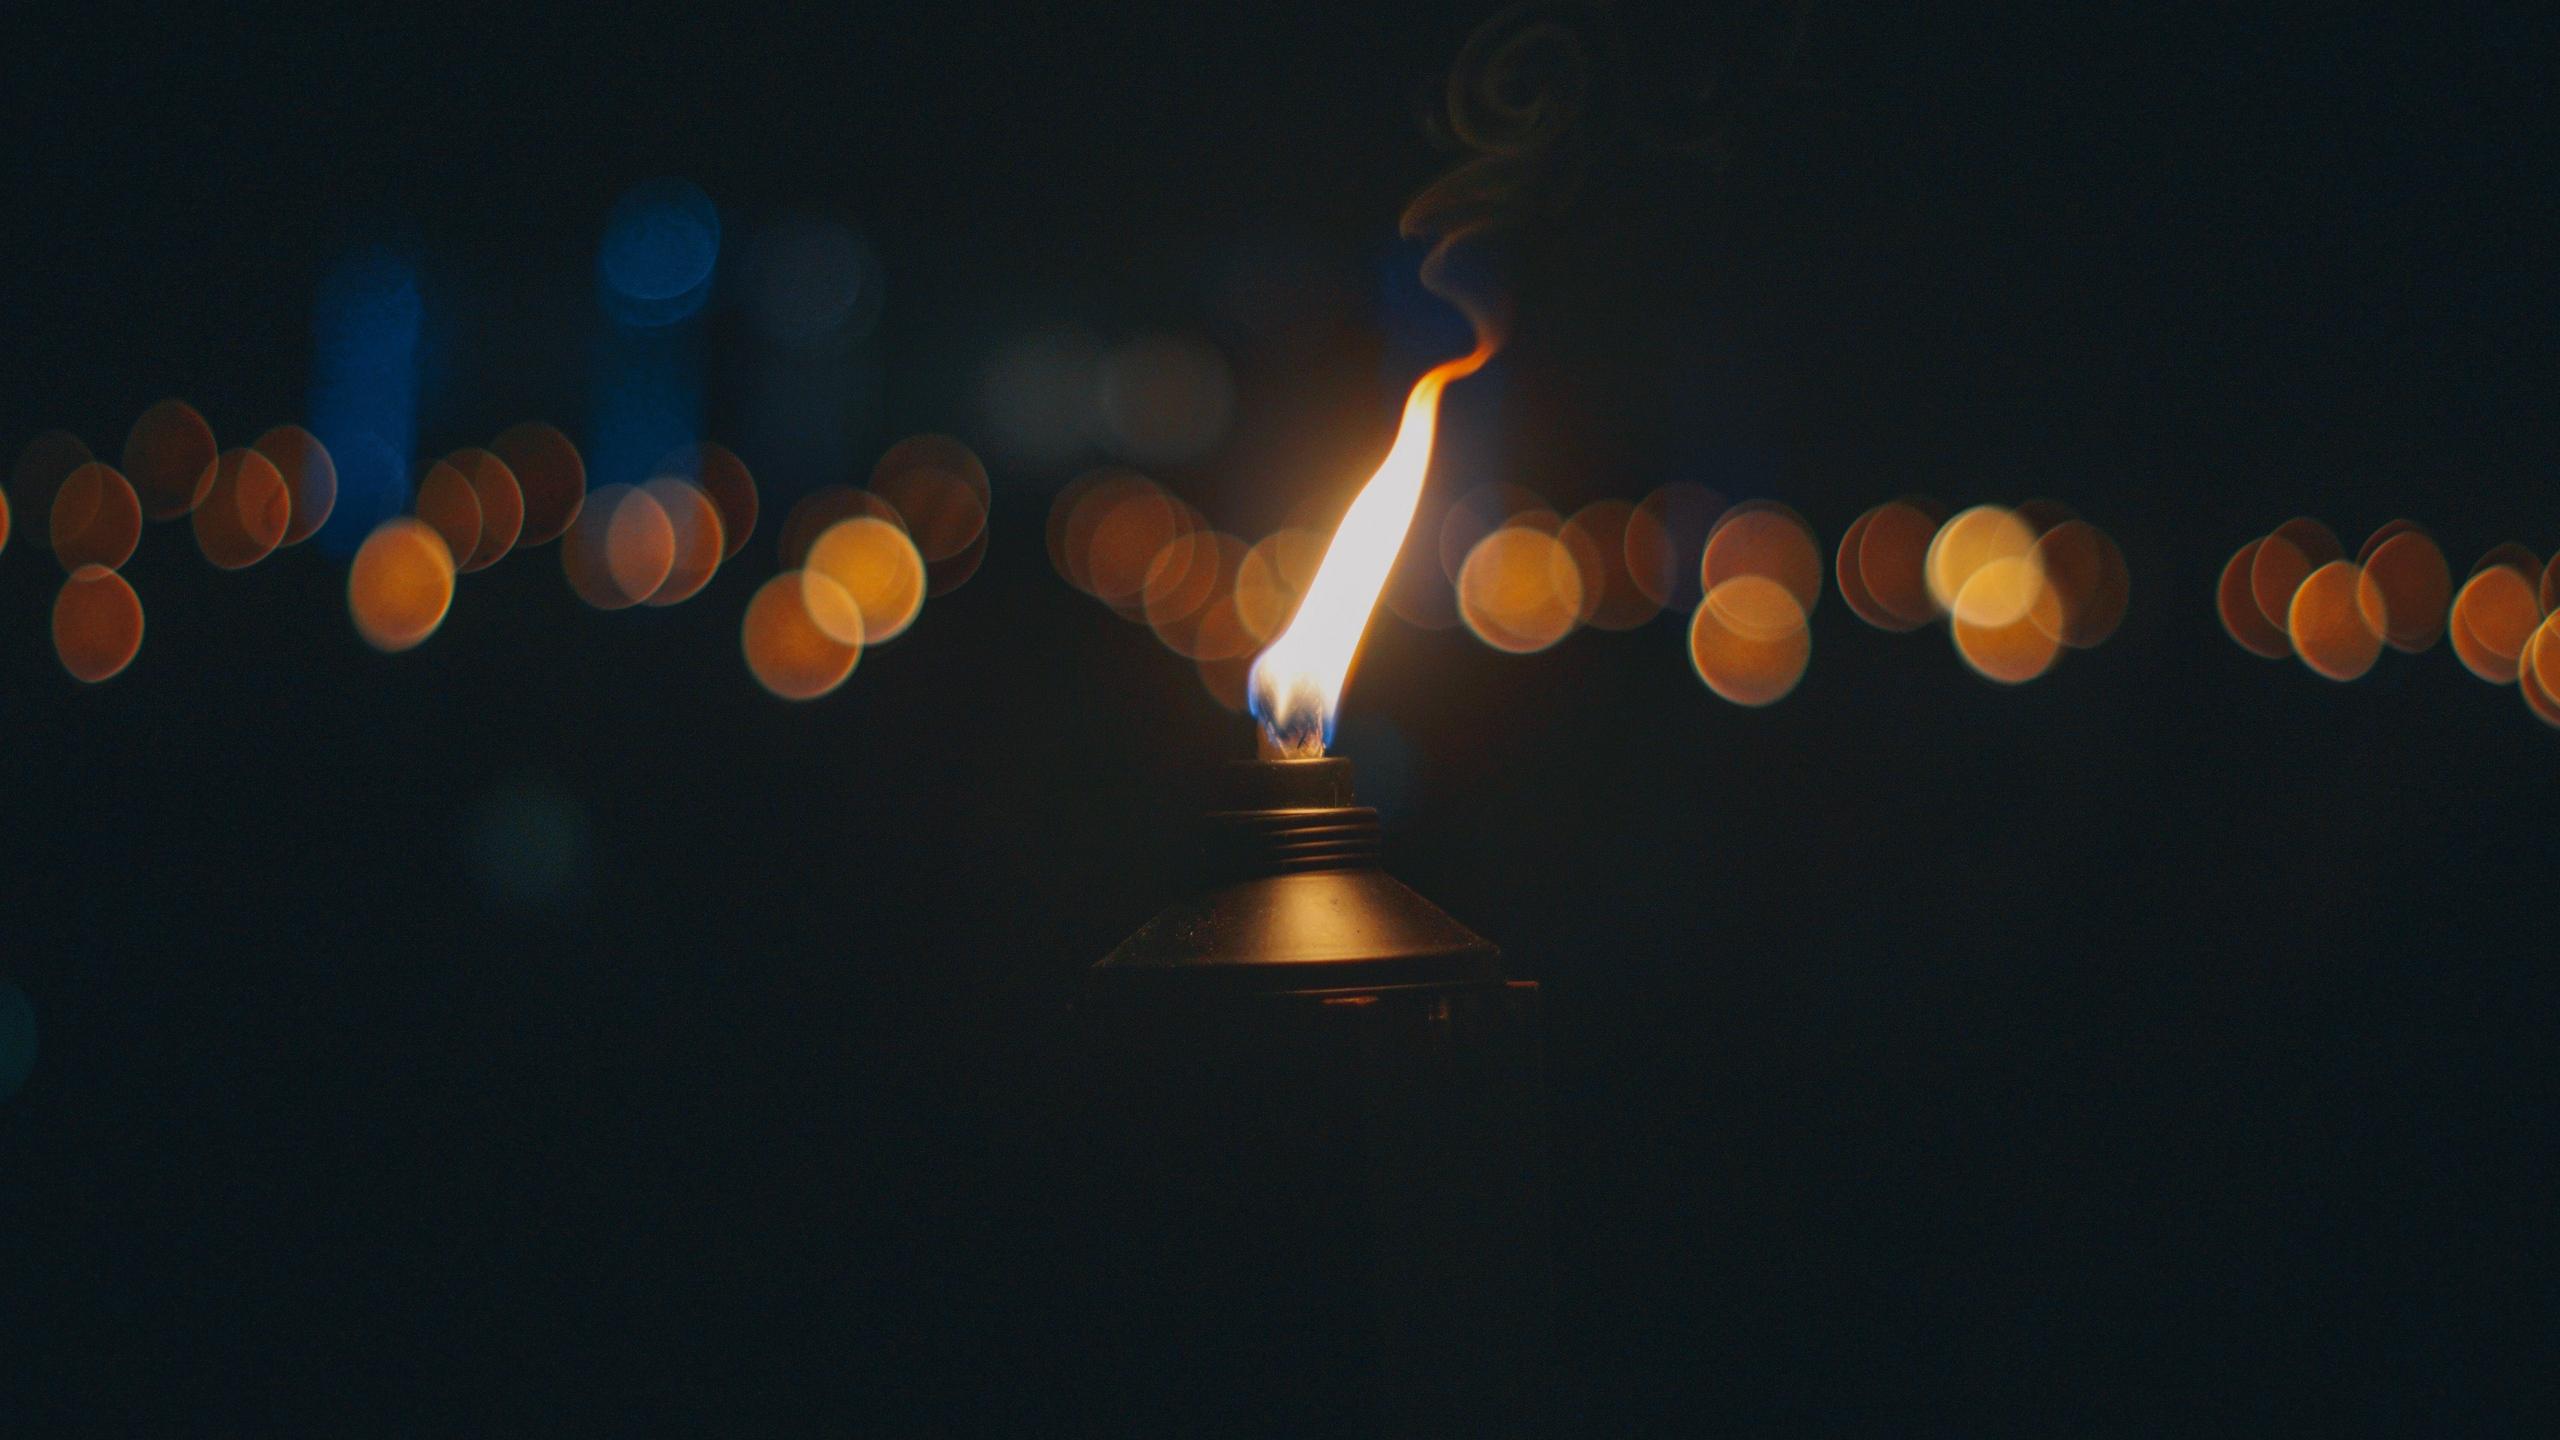 Download wallpaper 2560x1440 torch fire wick glare widescreen 2560x1440